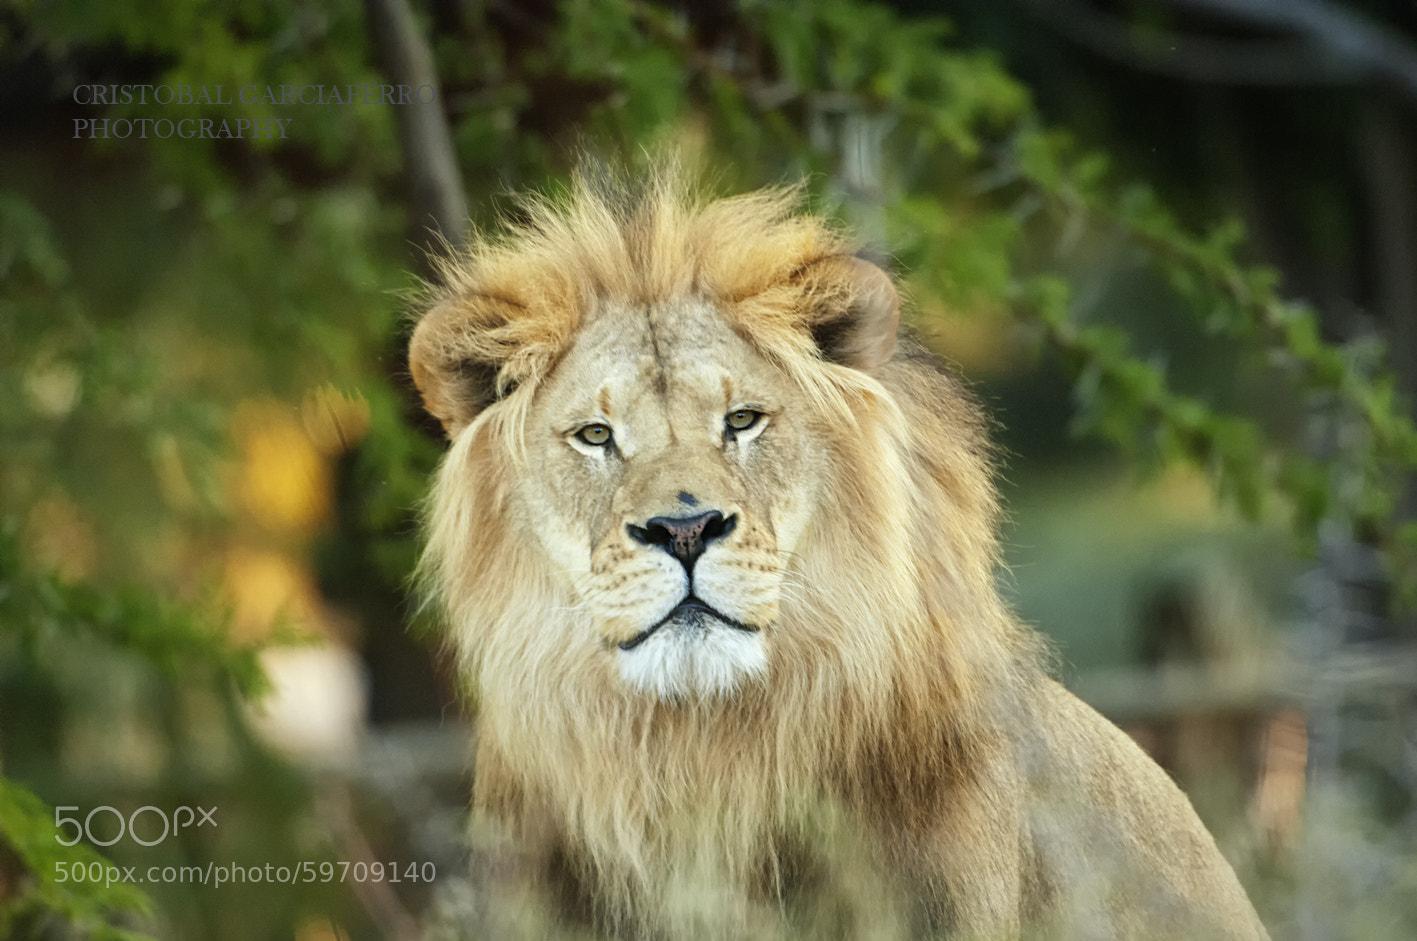 Photograph Lion King by Cristobal Garciaferro Rubio on 500px